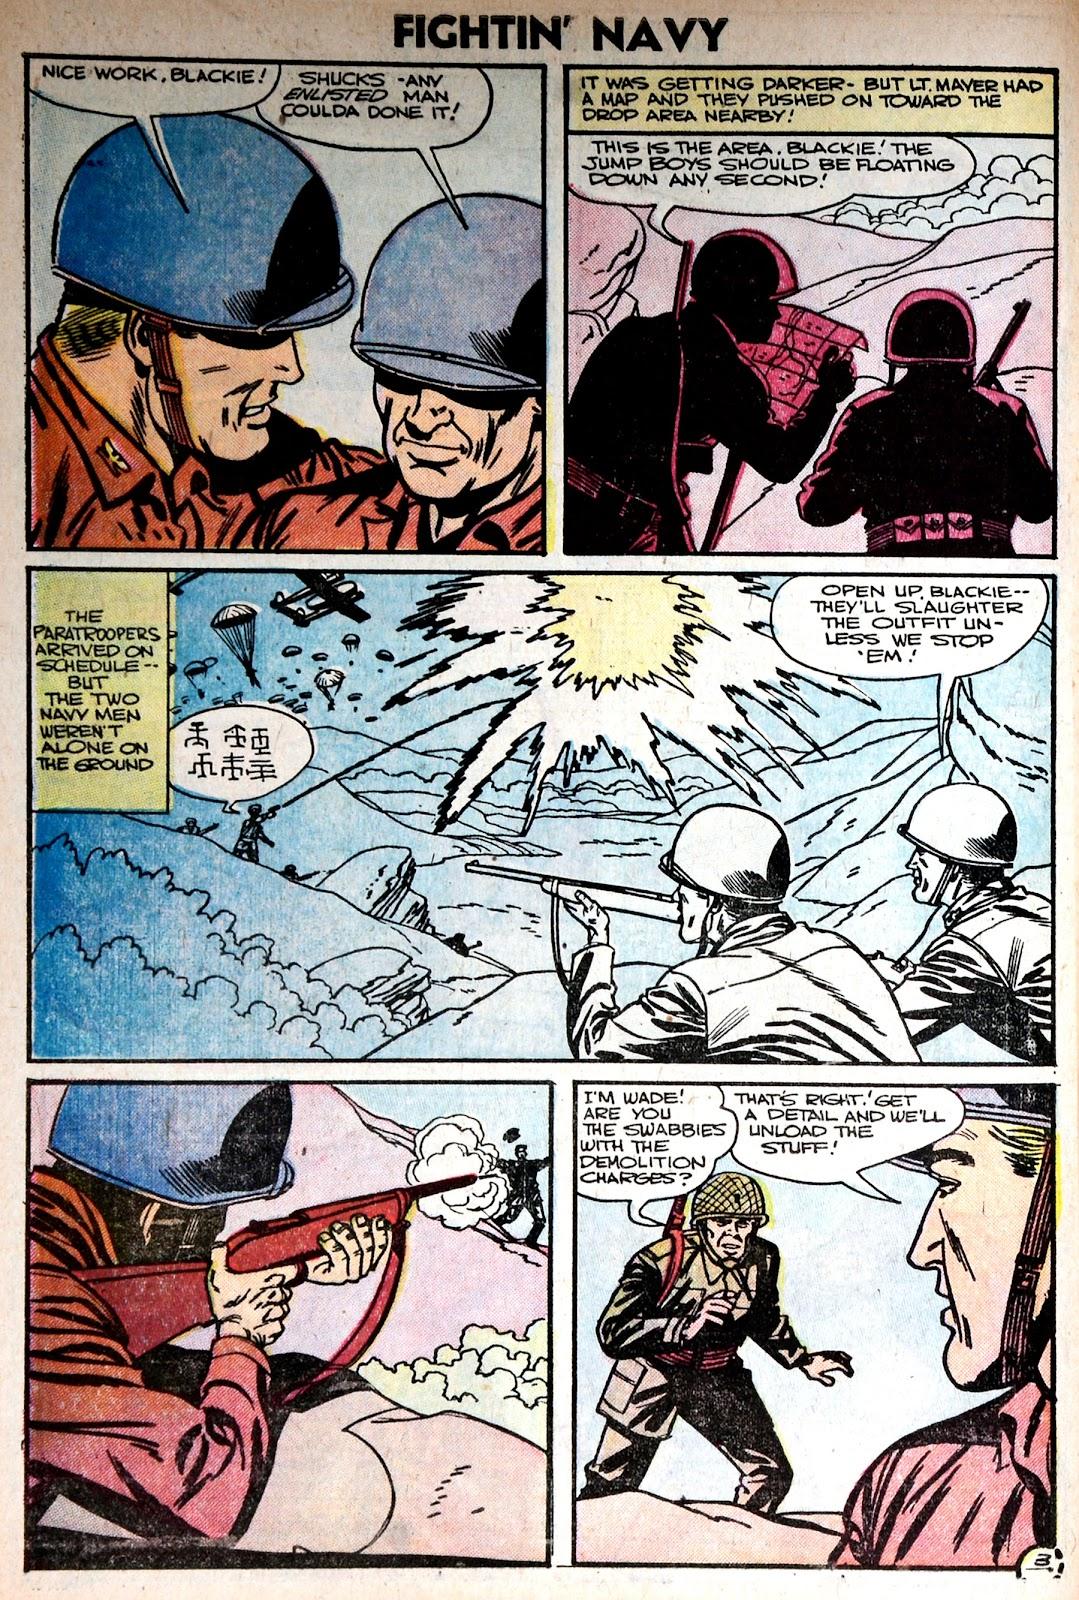 Read online Fightin' Navy comic -  Issue #75 - 30